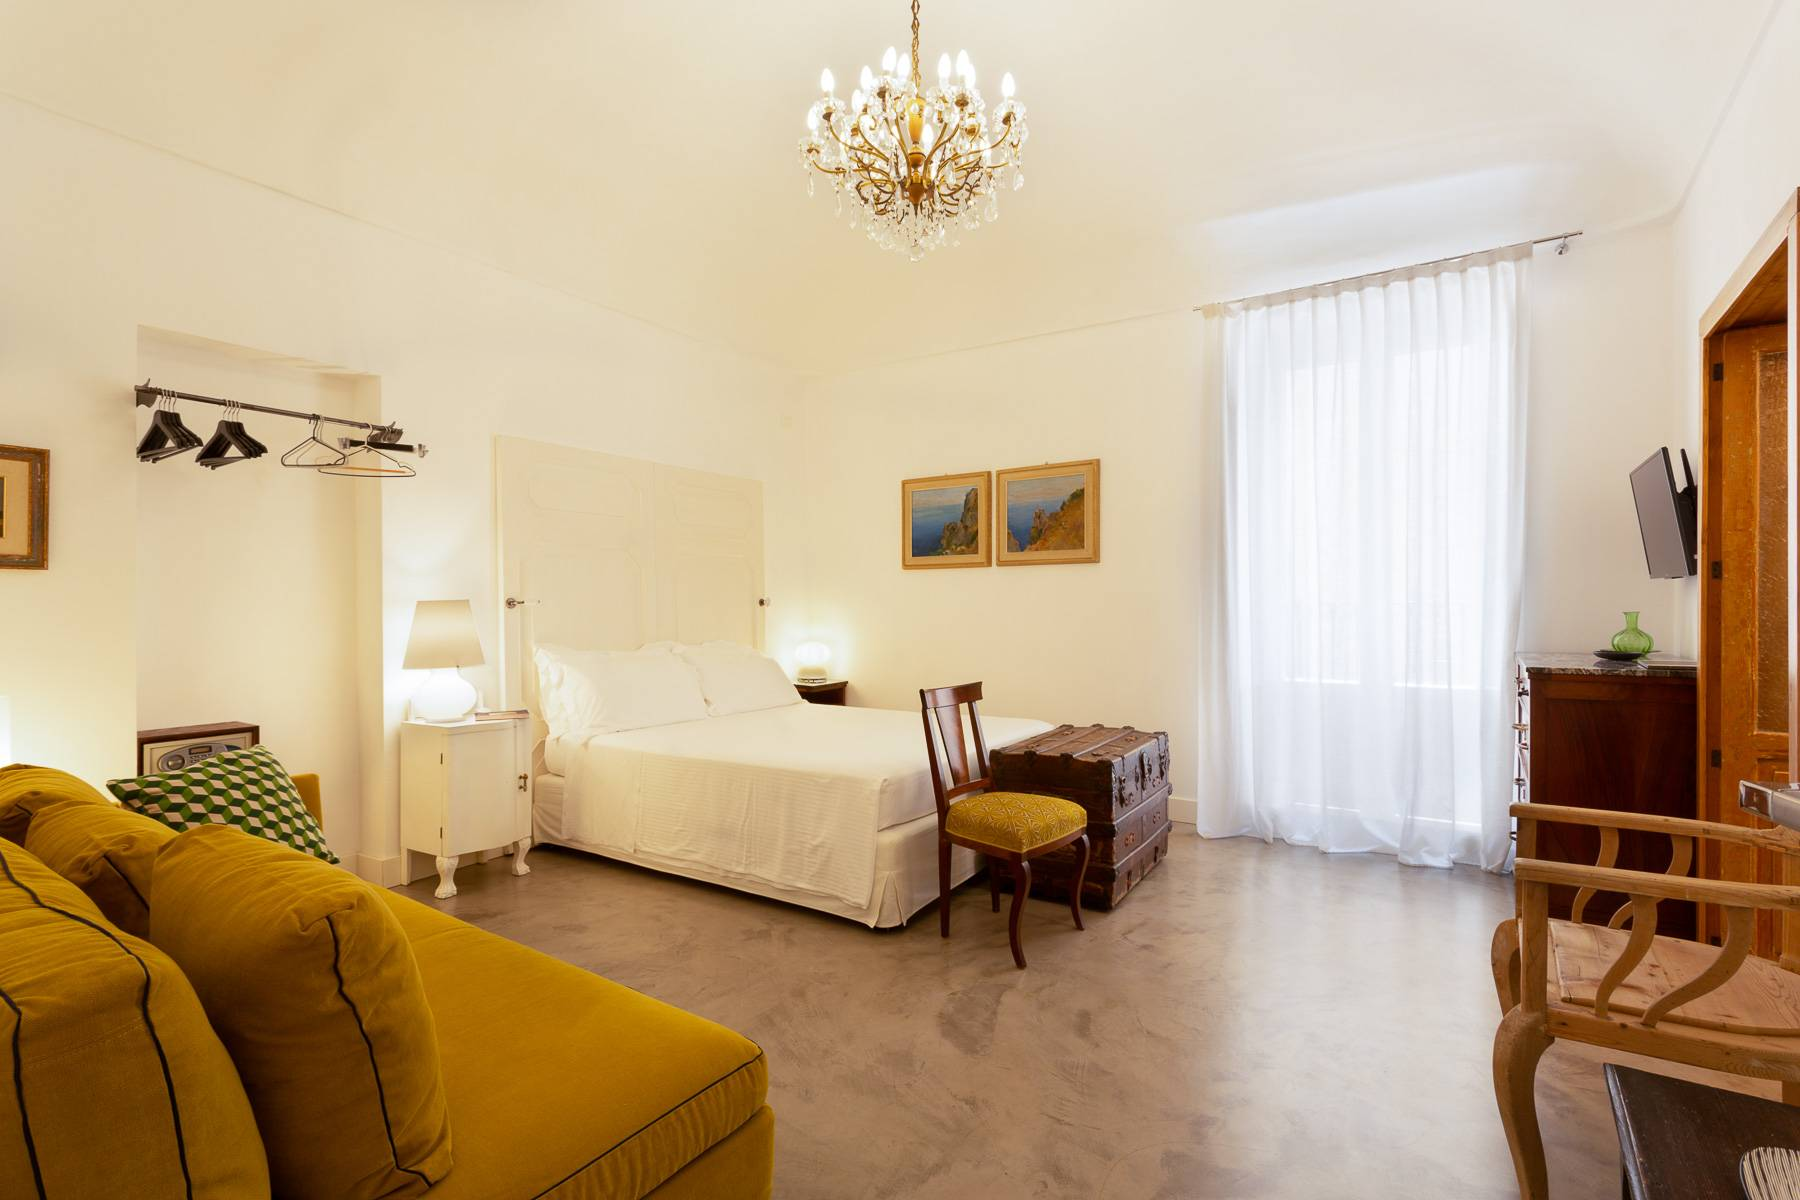 Casa indipendente in Vendita a Noto: 5 locali, 171 mq - Foto 20